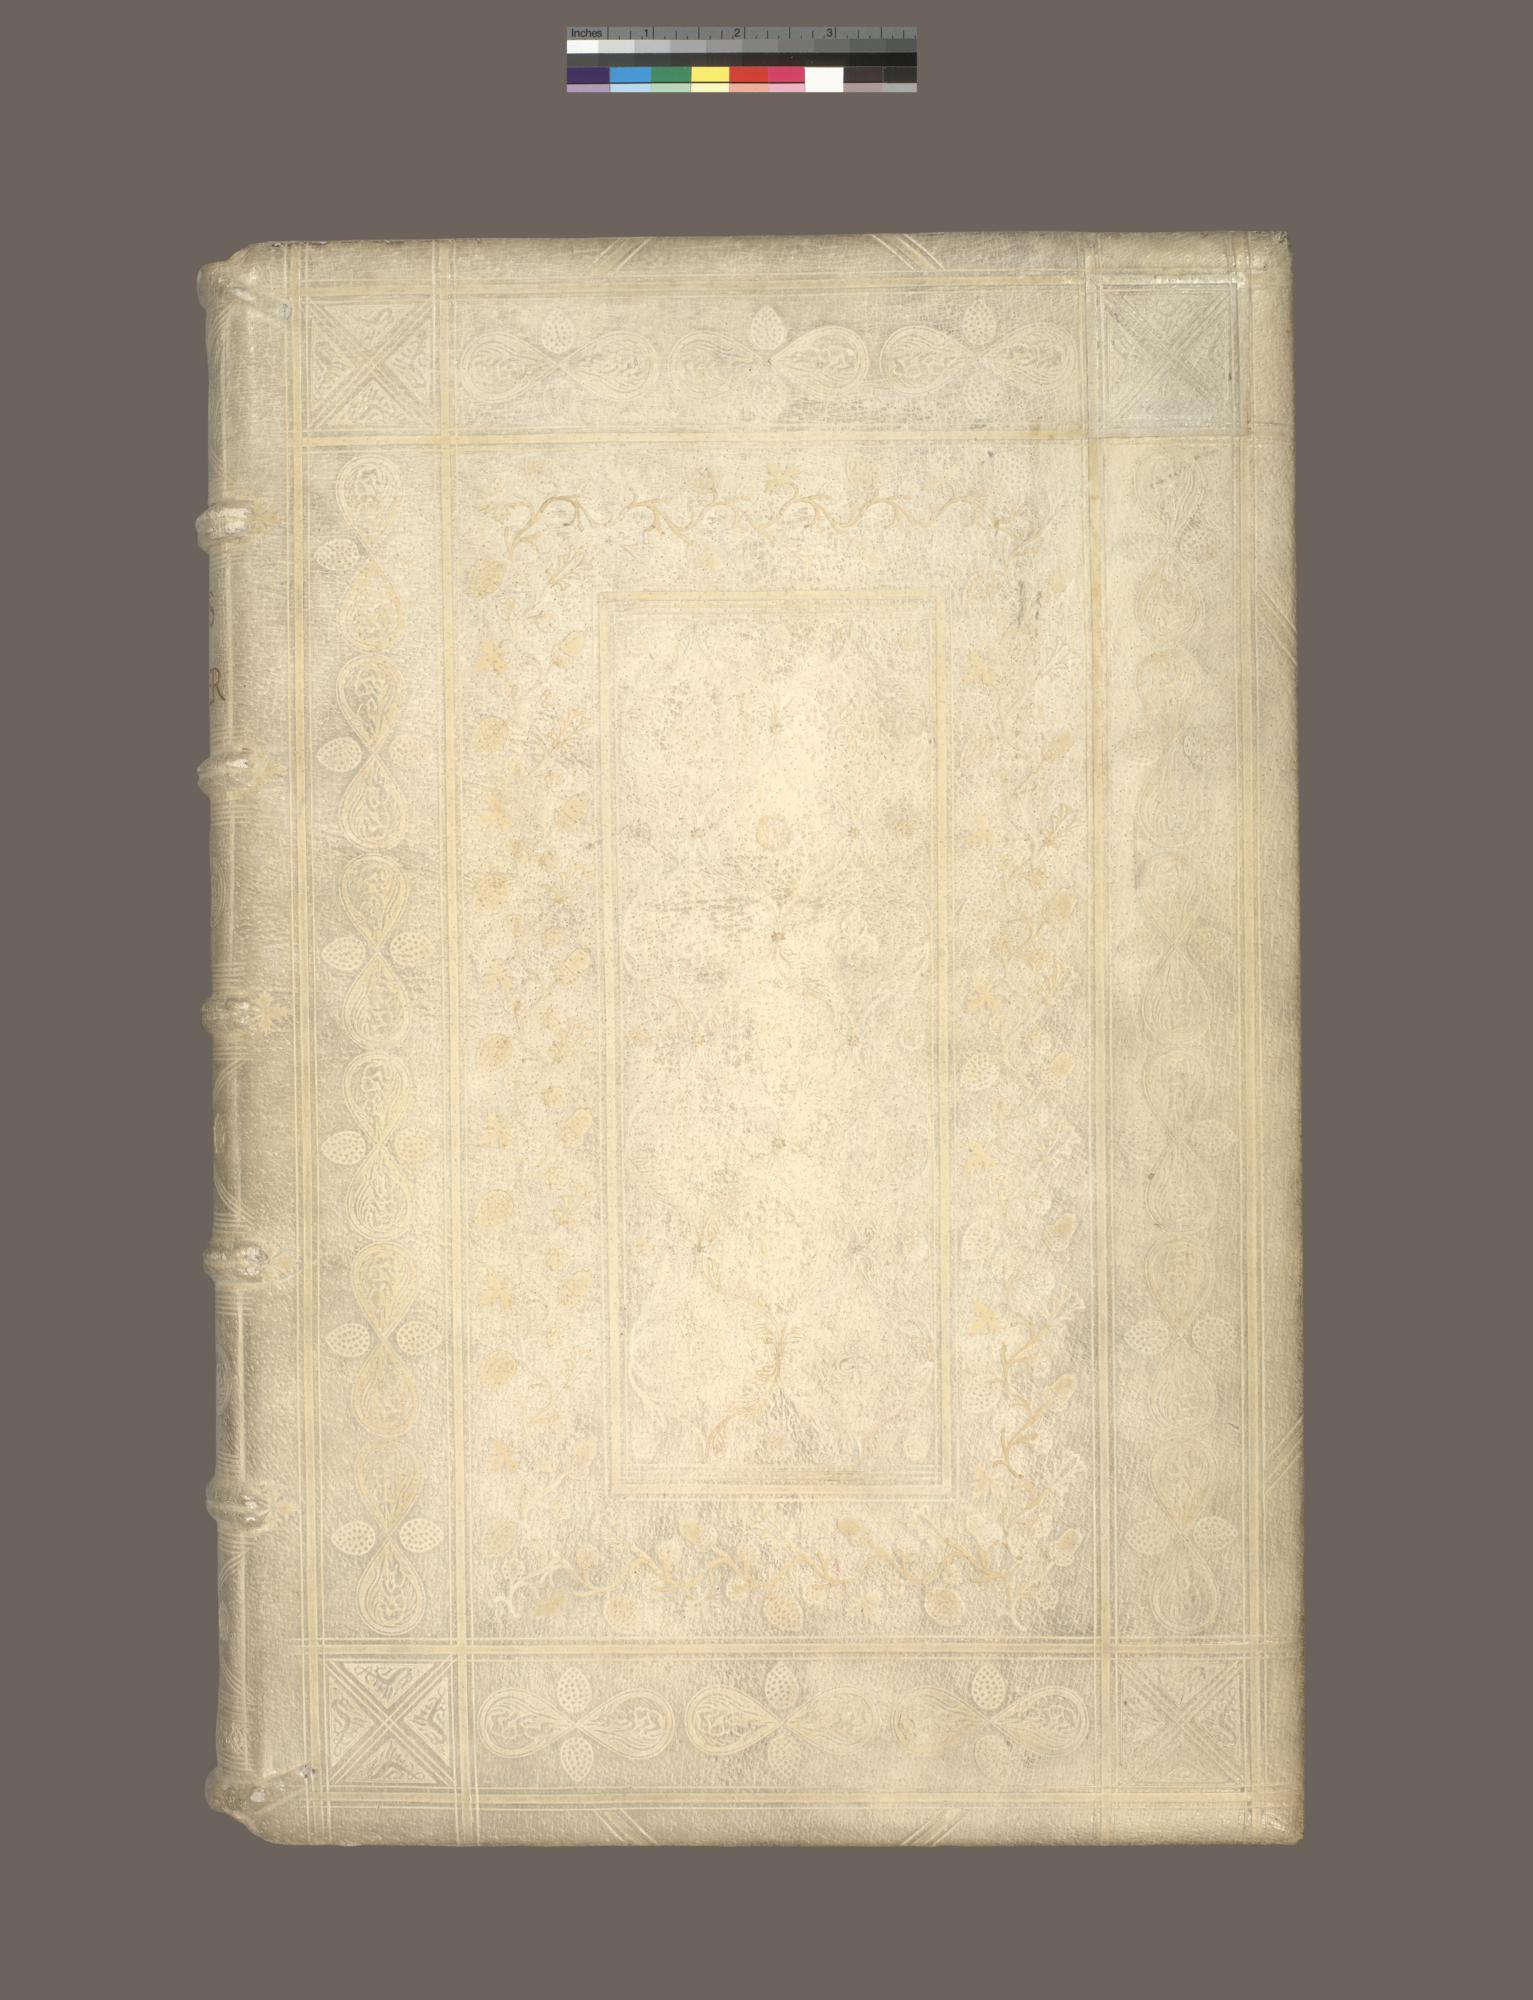 Specimen copy of the Kelmscott Chaucer